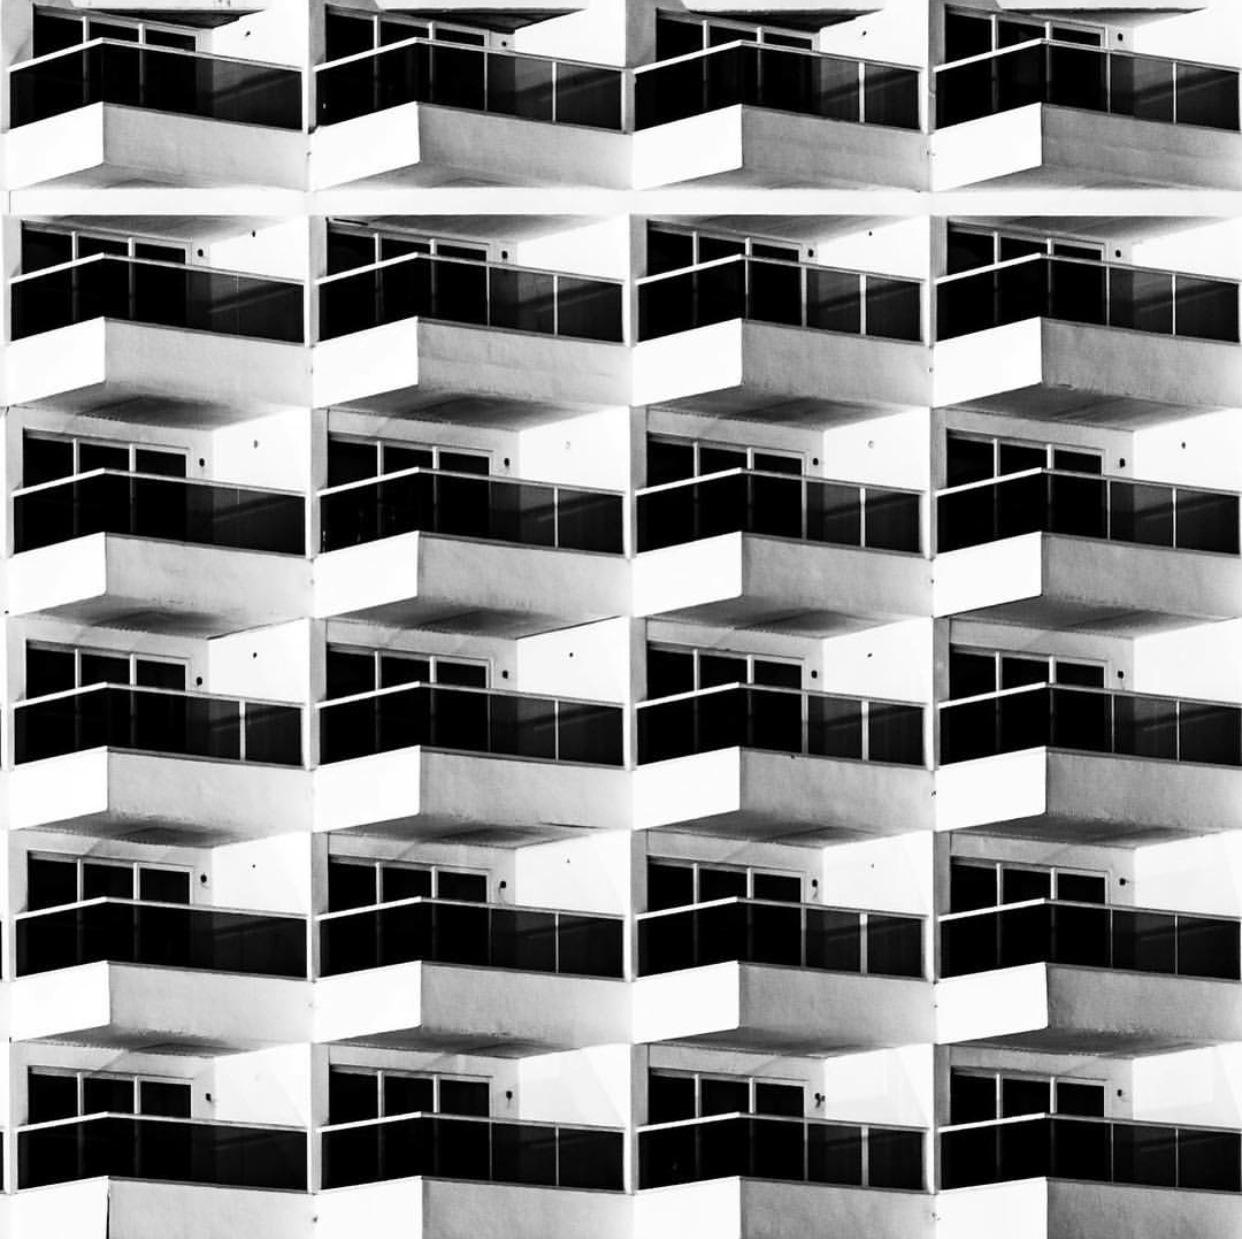 24 balconies by Héctor Antuna